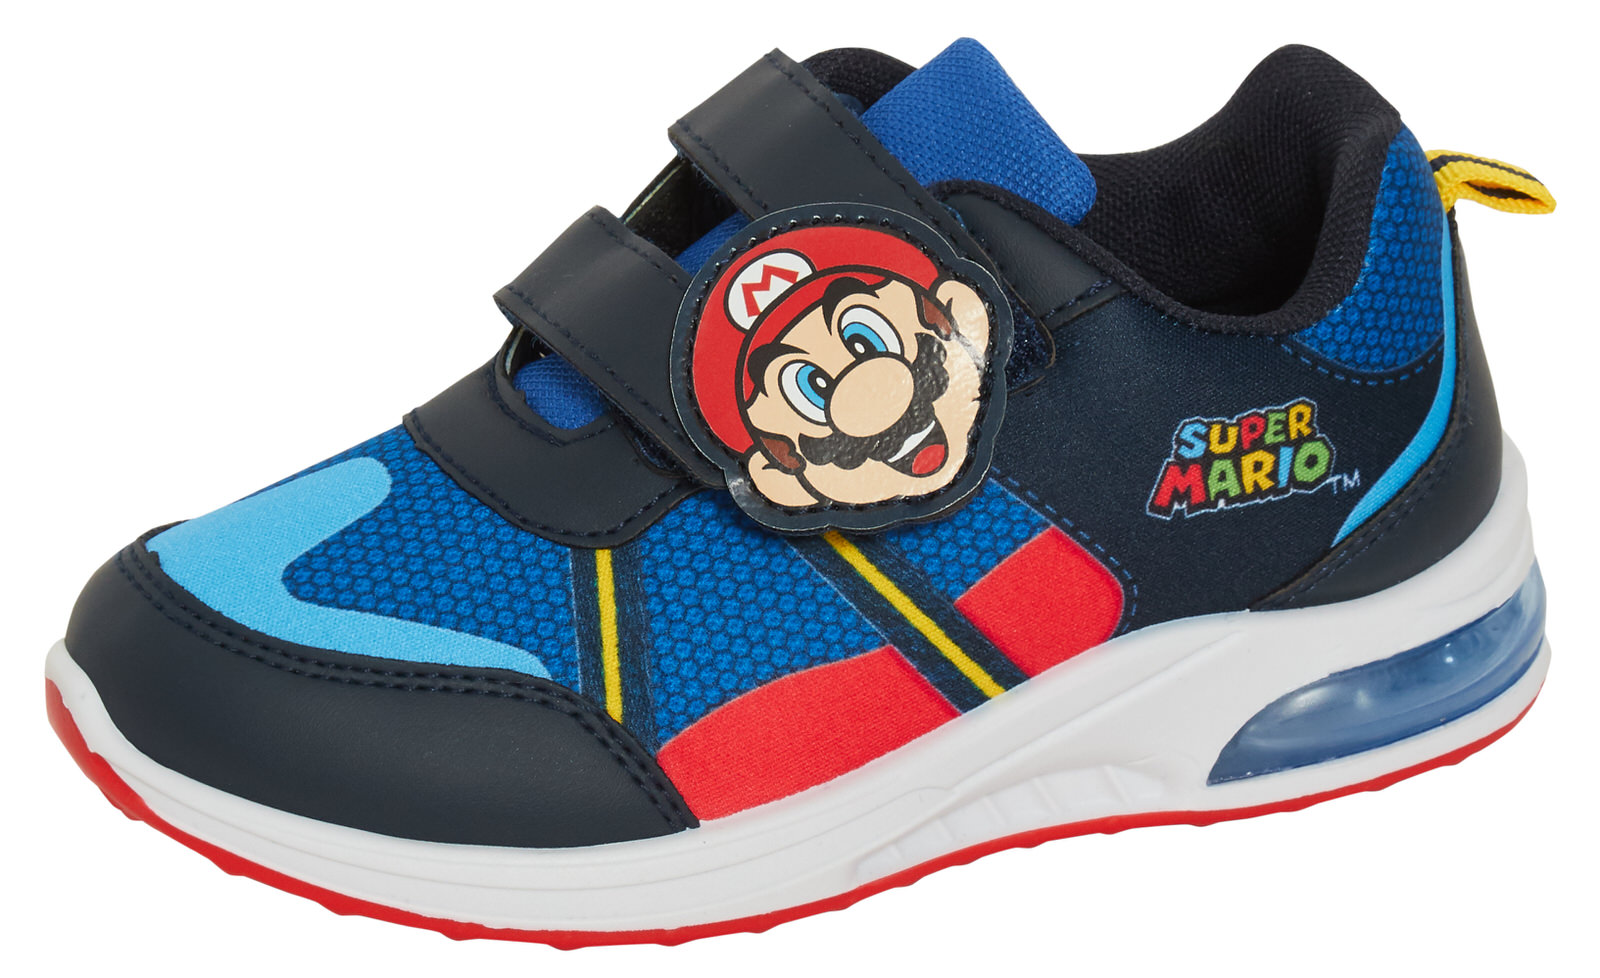 miniatuur 11 - Boys Super Mario Brothers Light Up Trainers Kids Nintendo Flashing Lights Shoes